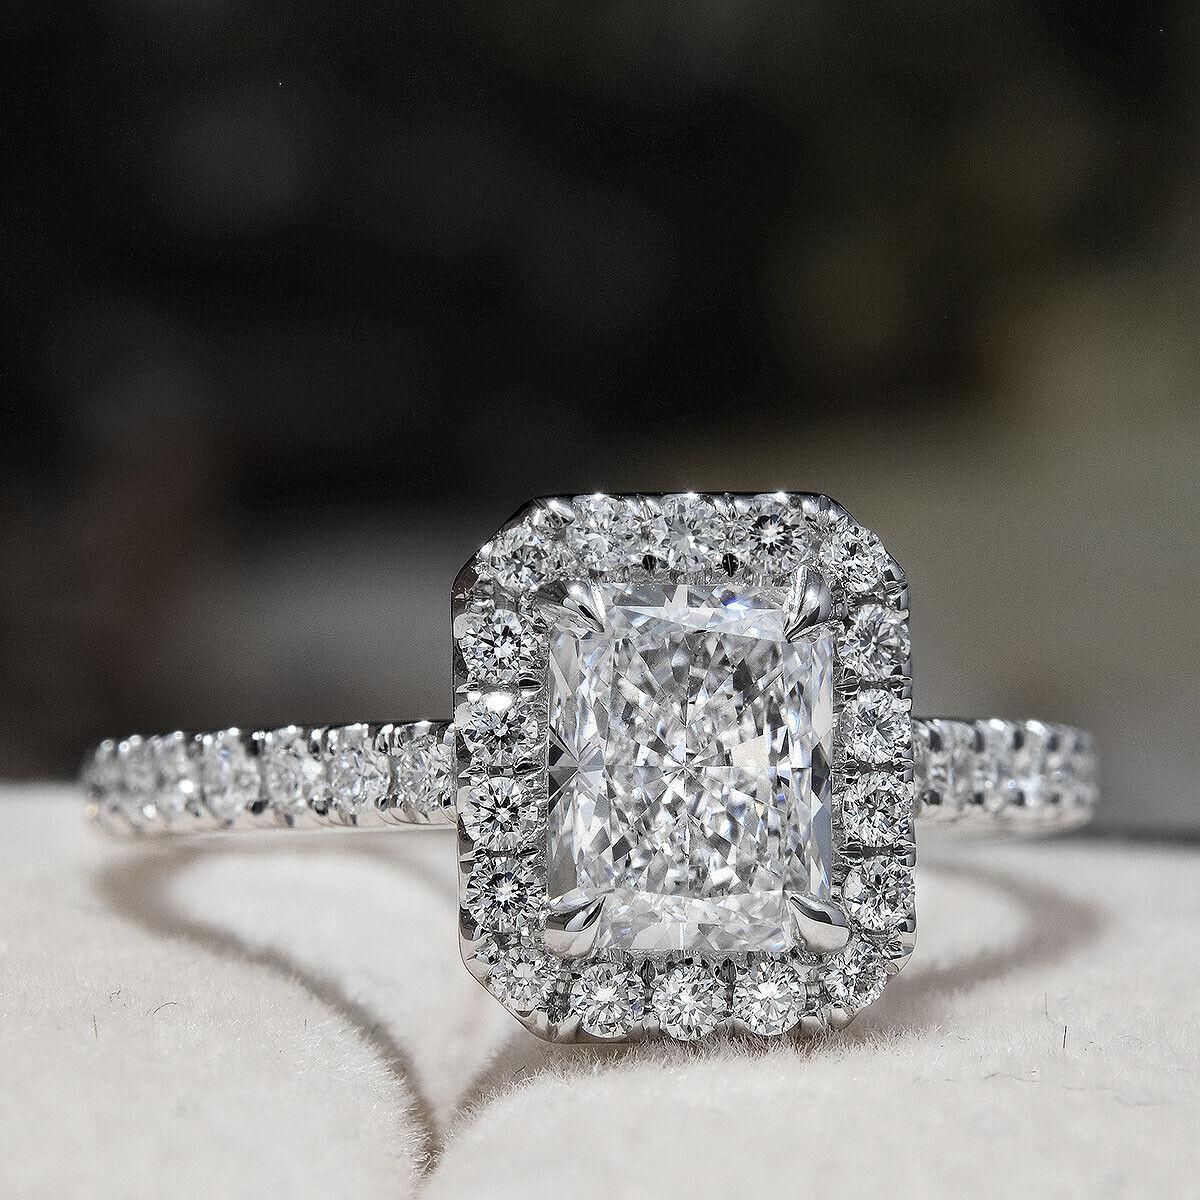 18K WG 1.80 Ctw Radiant Cut Diamond Eternity Halo Engagement Ring H,VS2 GIA 2